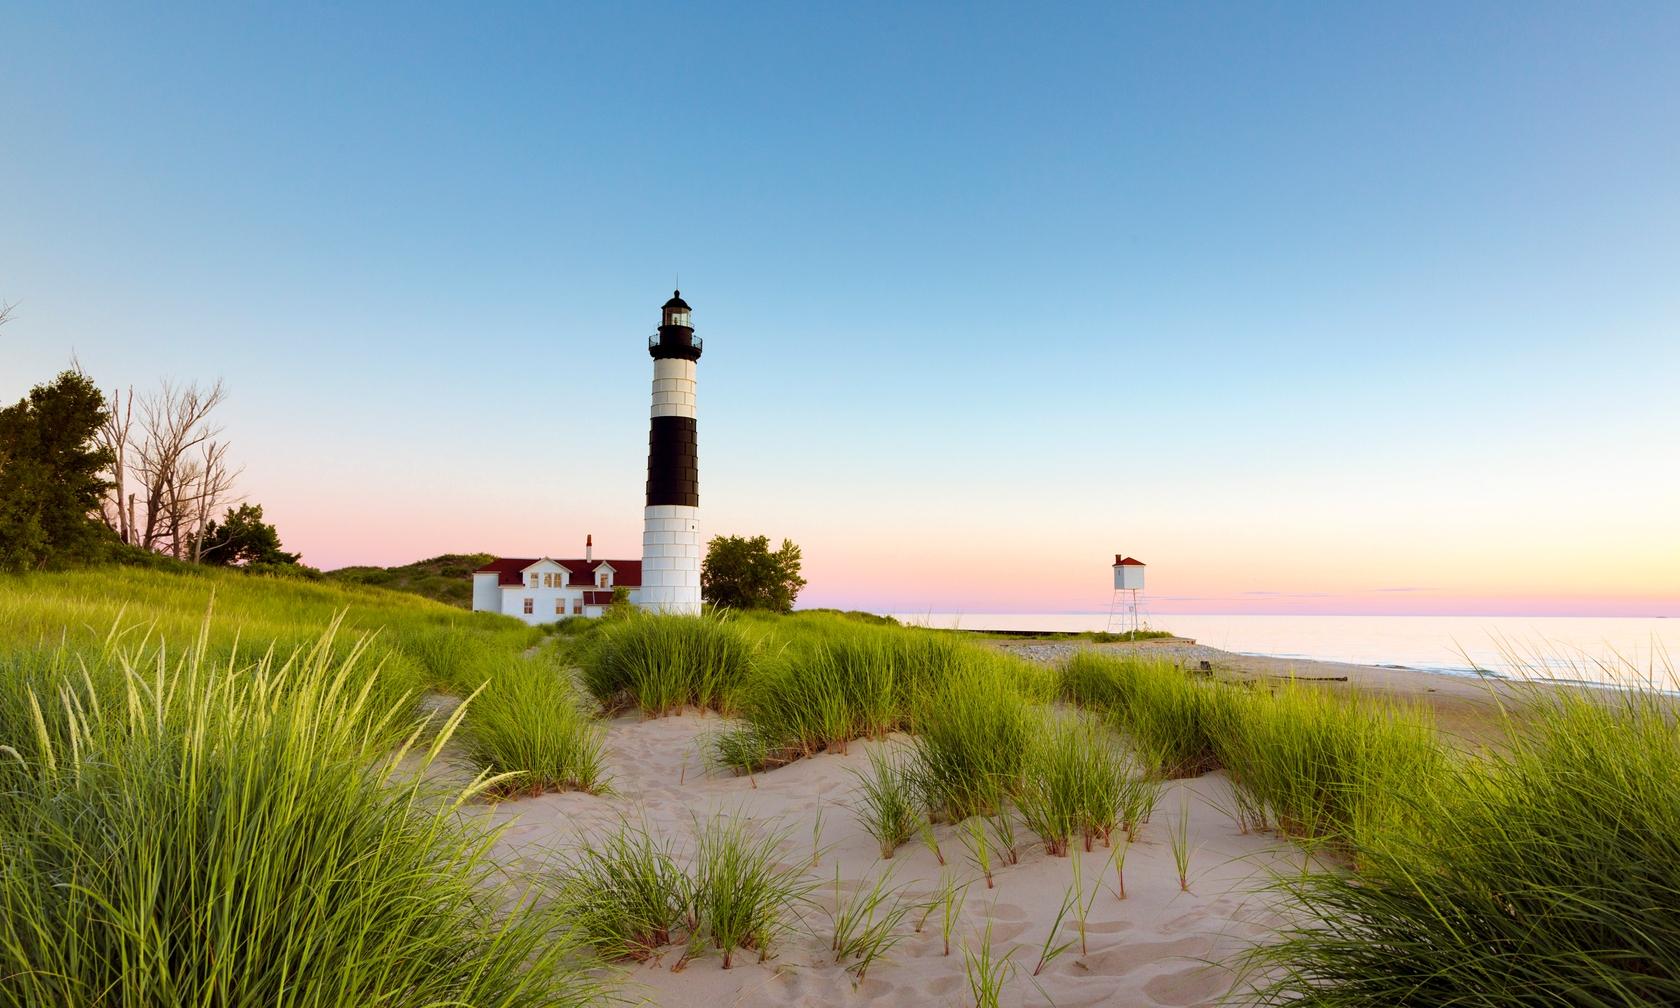 Vacation rentals in Lake Michigan Beach